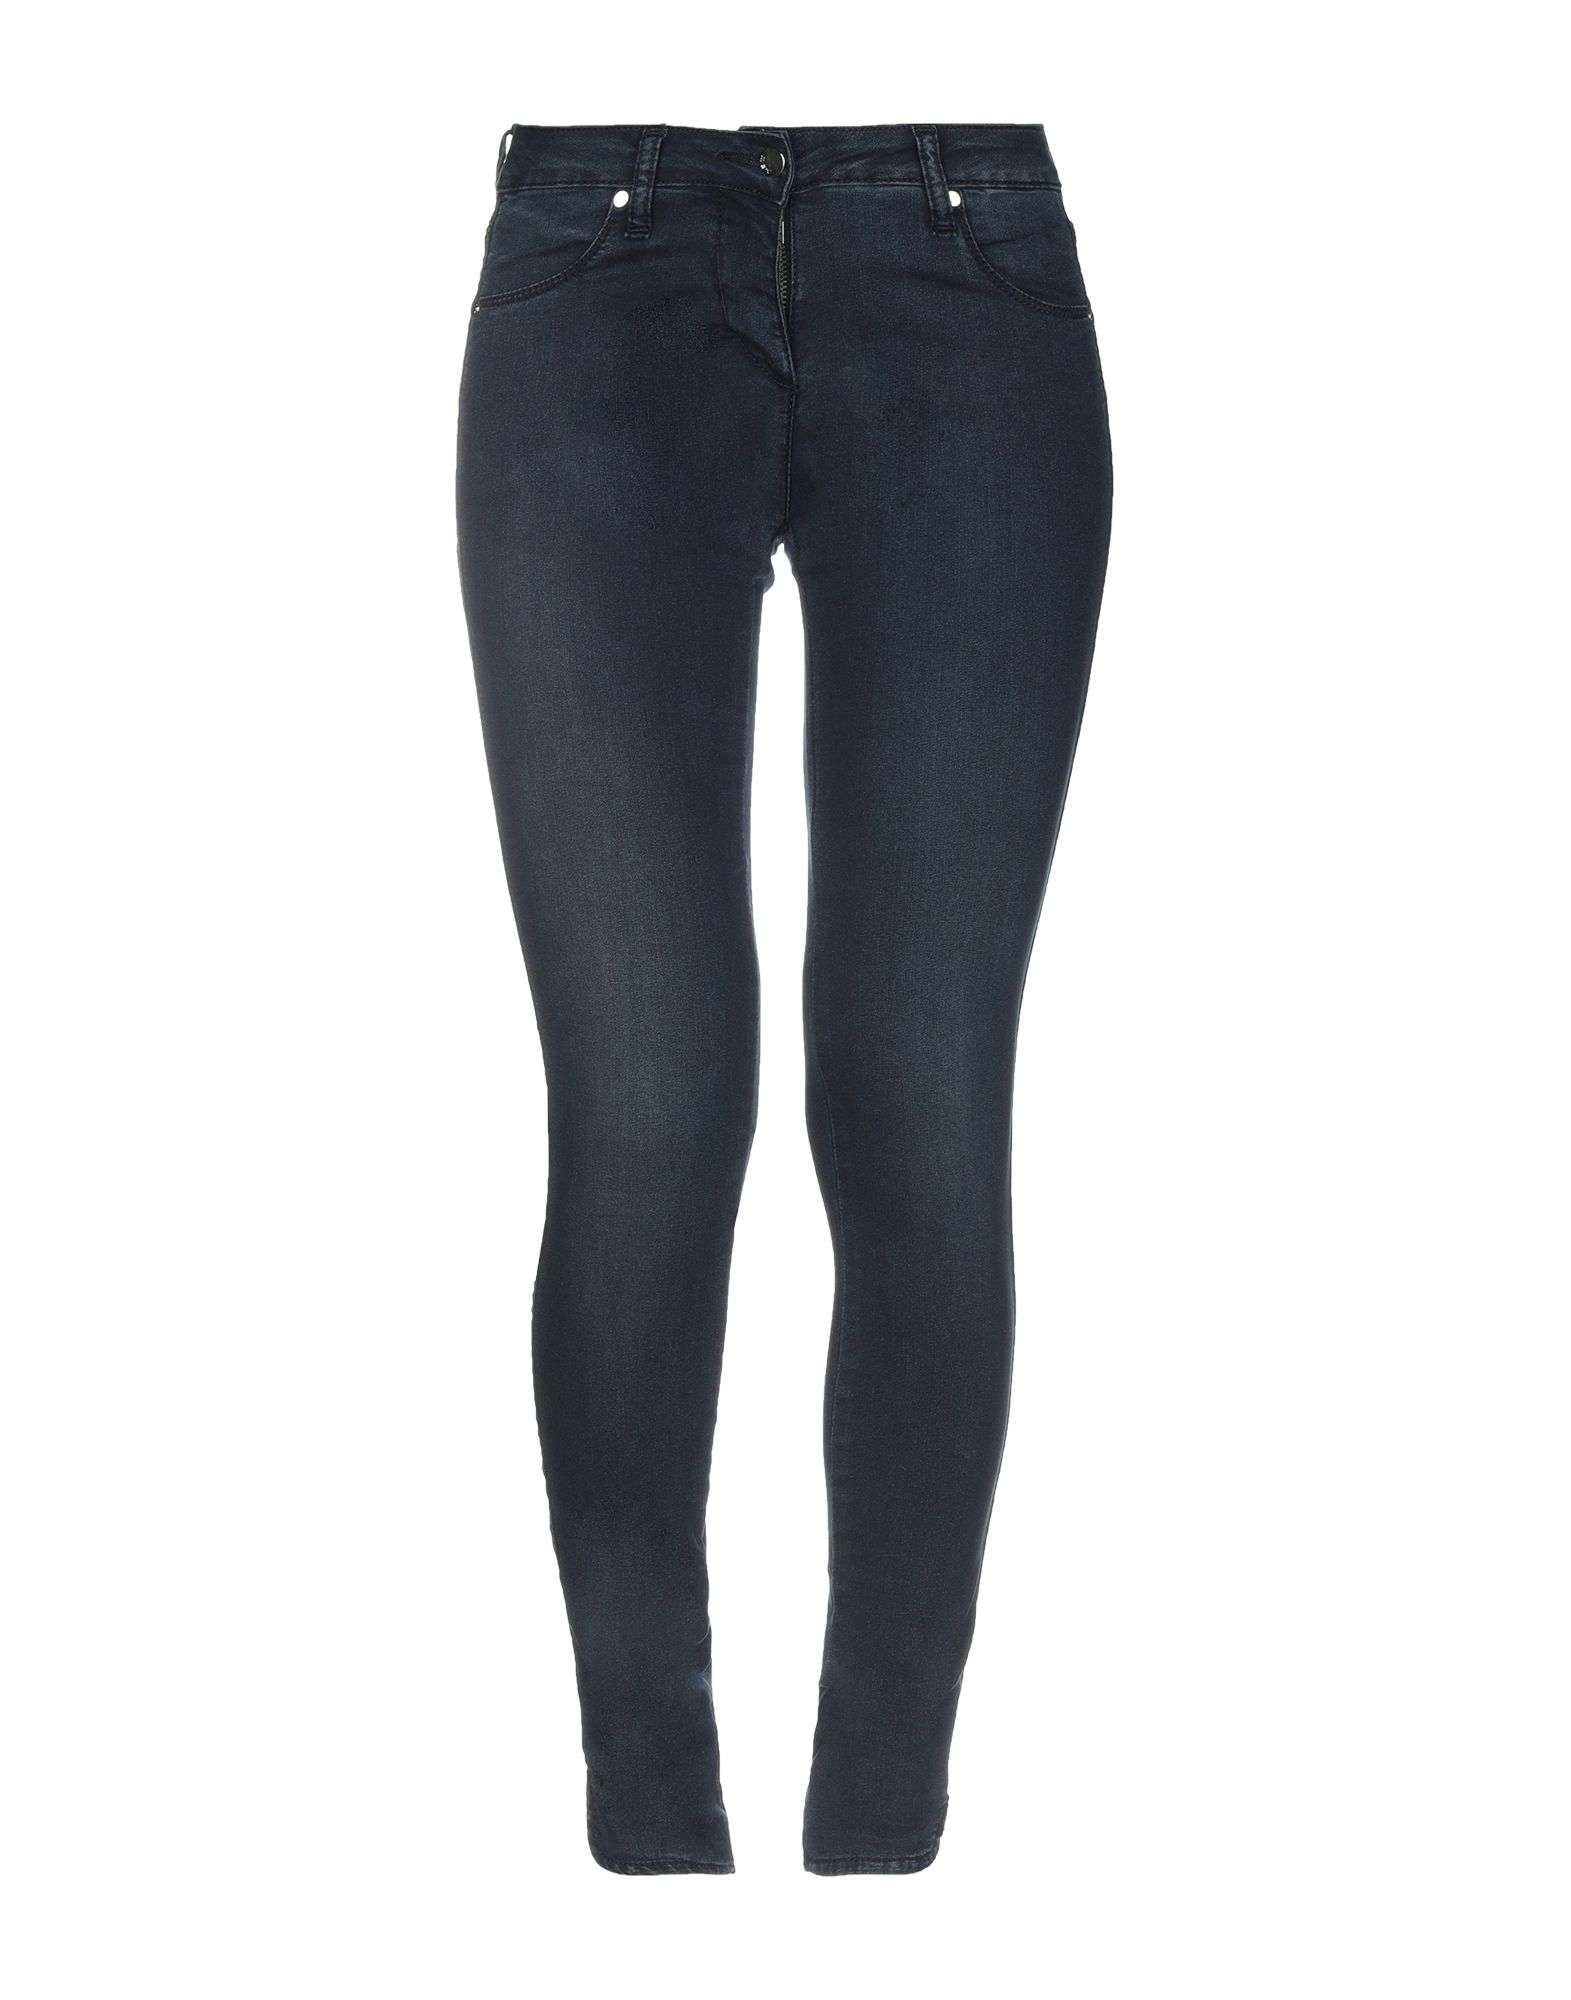 Pantaloni Jeans Met donna donna donna - 42707757DM 316